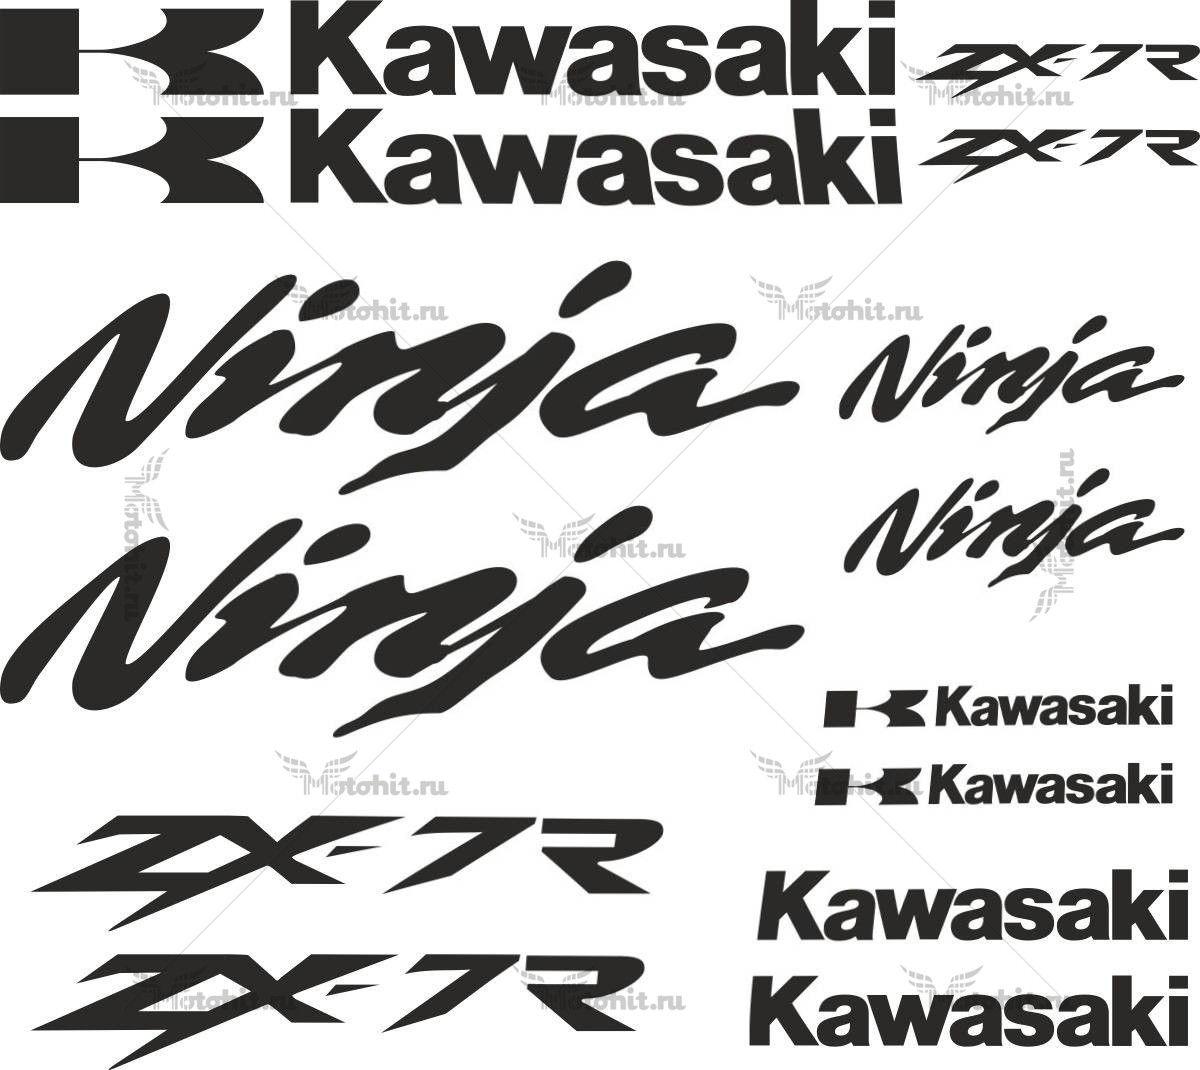 Комплект наклеек Kawasaki ZX-7R 14-STICKER